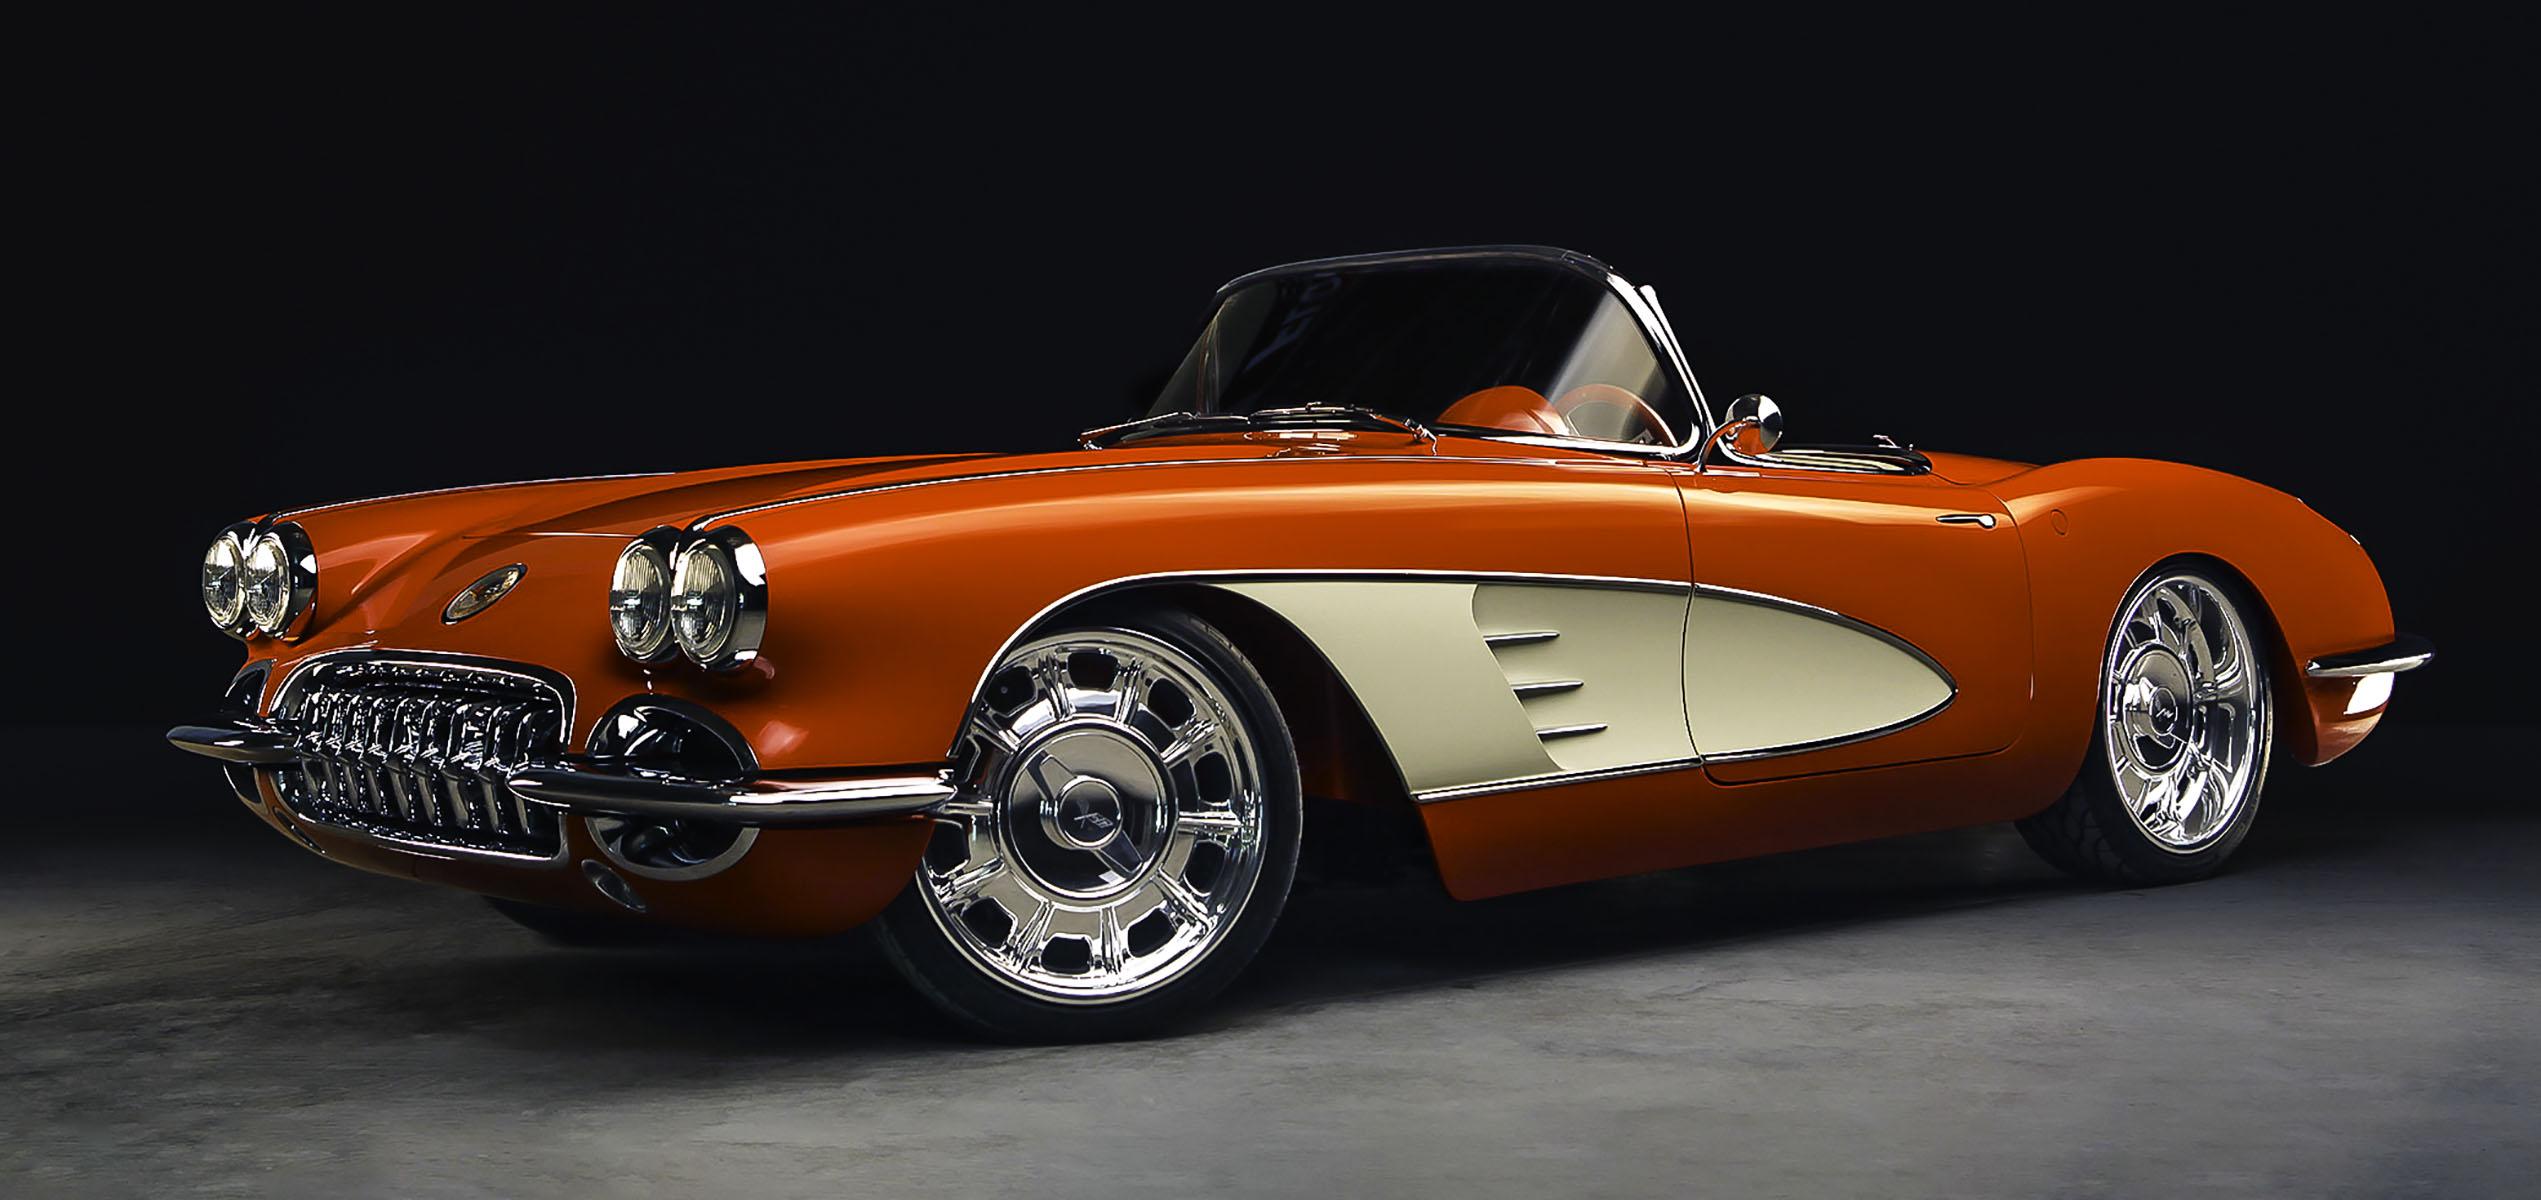 Corvette gallery